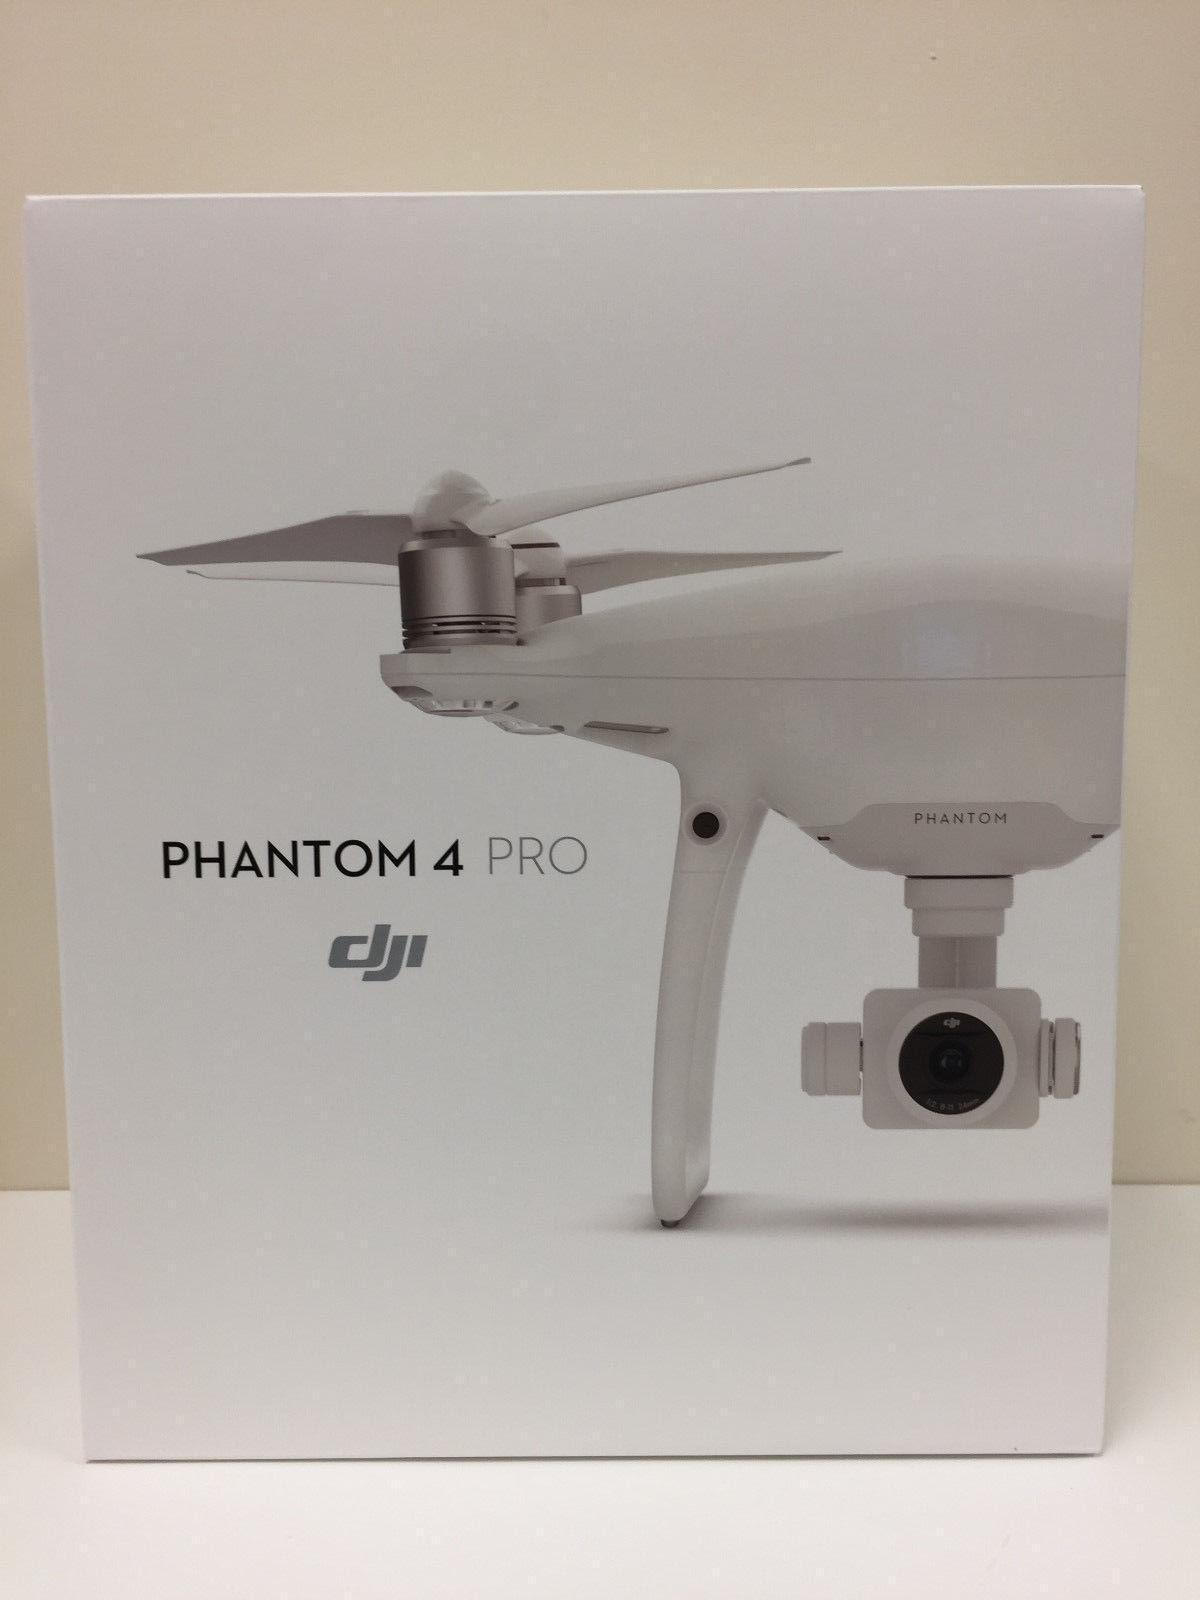 Selling New DJI Phantom 4 Pro / Yuneec Typhoon H Pro / DJI Mavic Pro